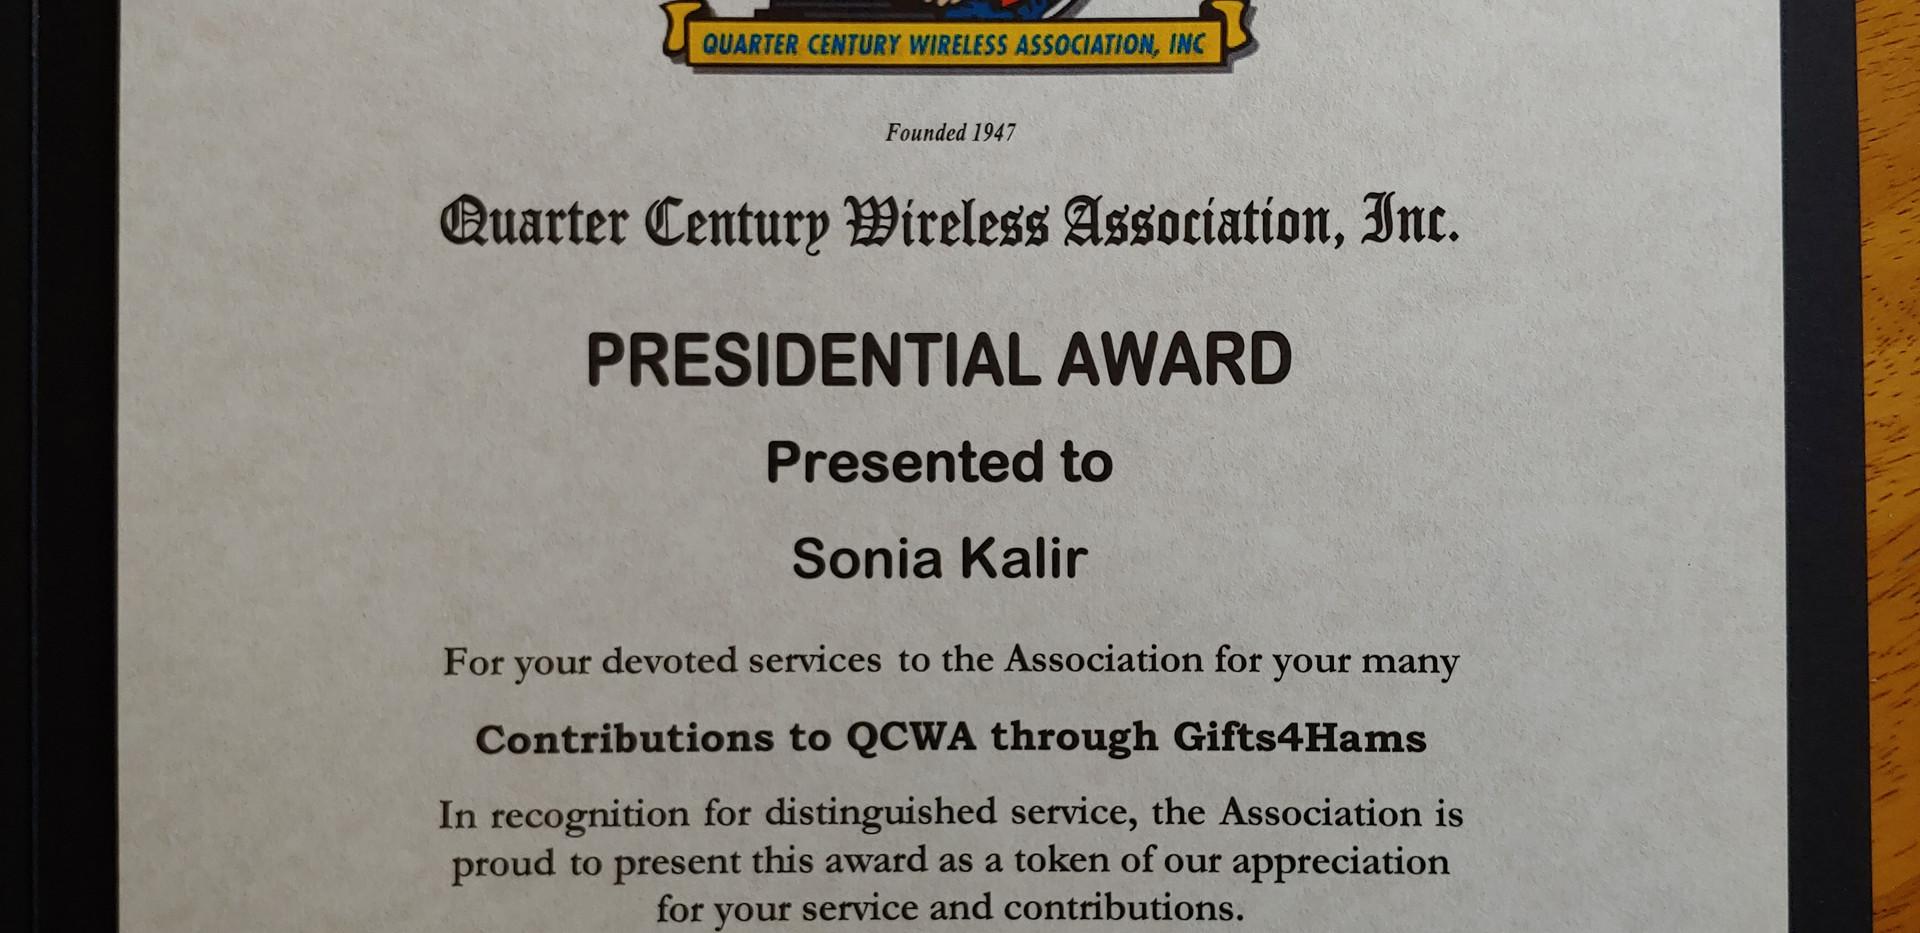 Presidential Award - Sonia